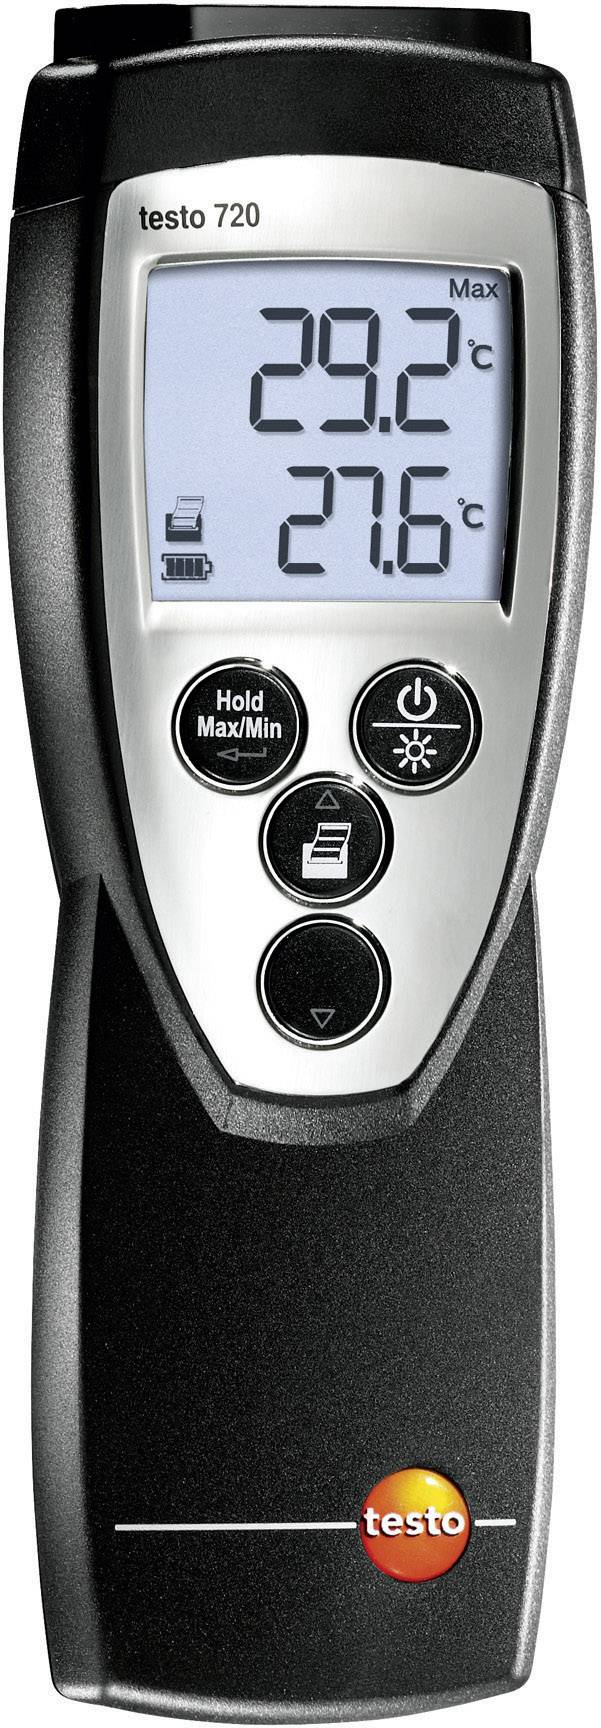 Teplomer testo 720, -100 až + 800 °C